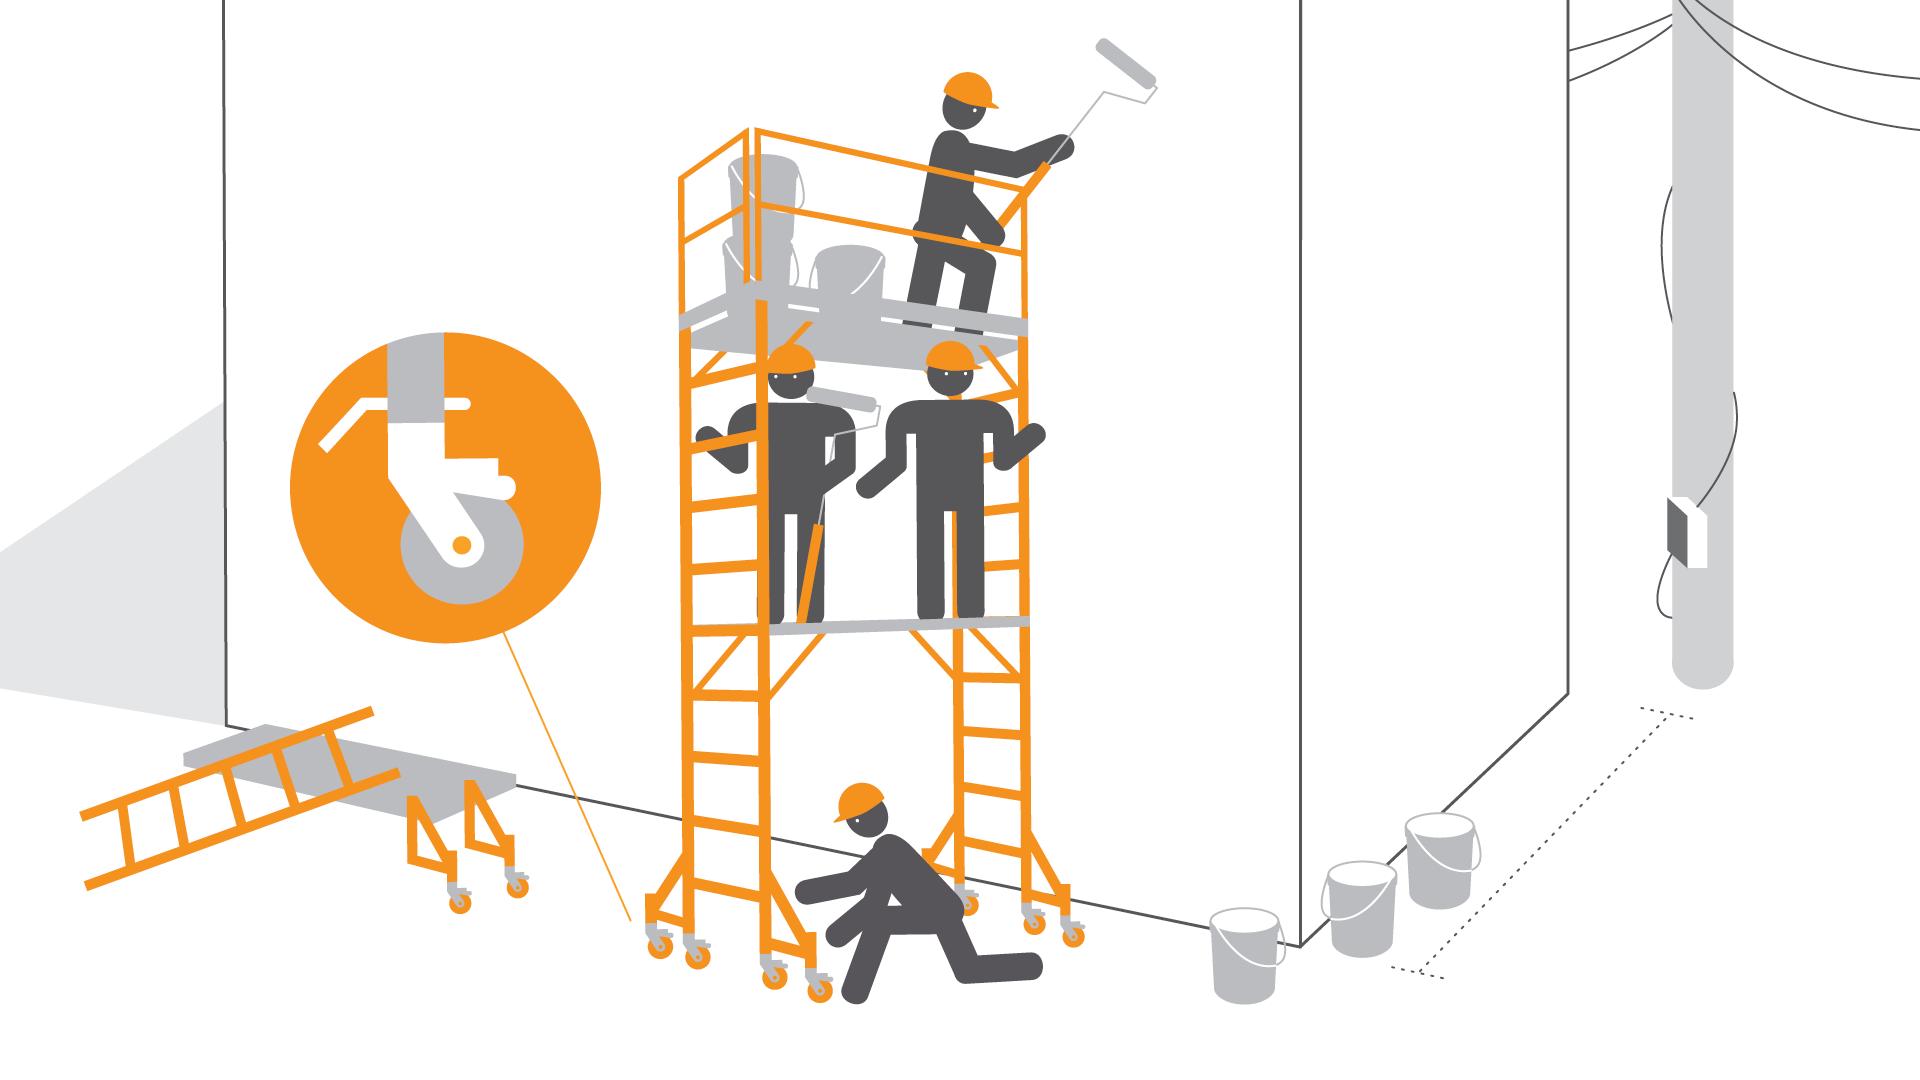 03_MobileScaffolding_Safety_v2B.png